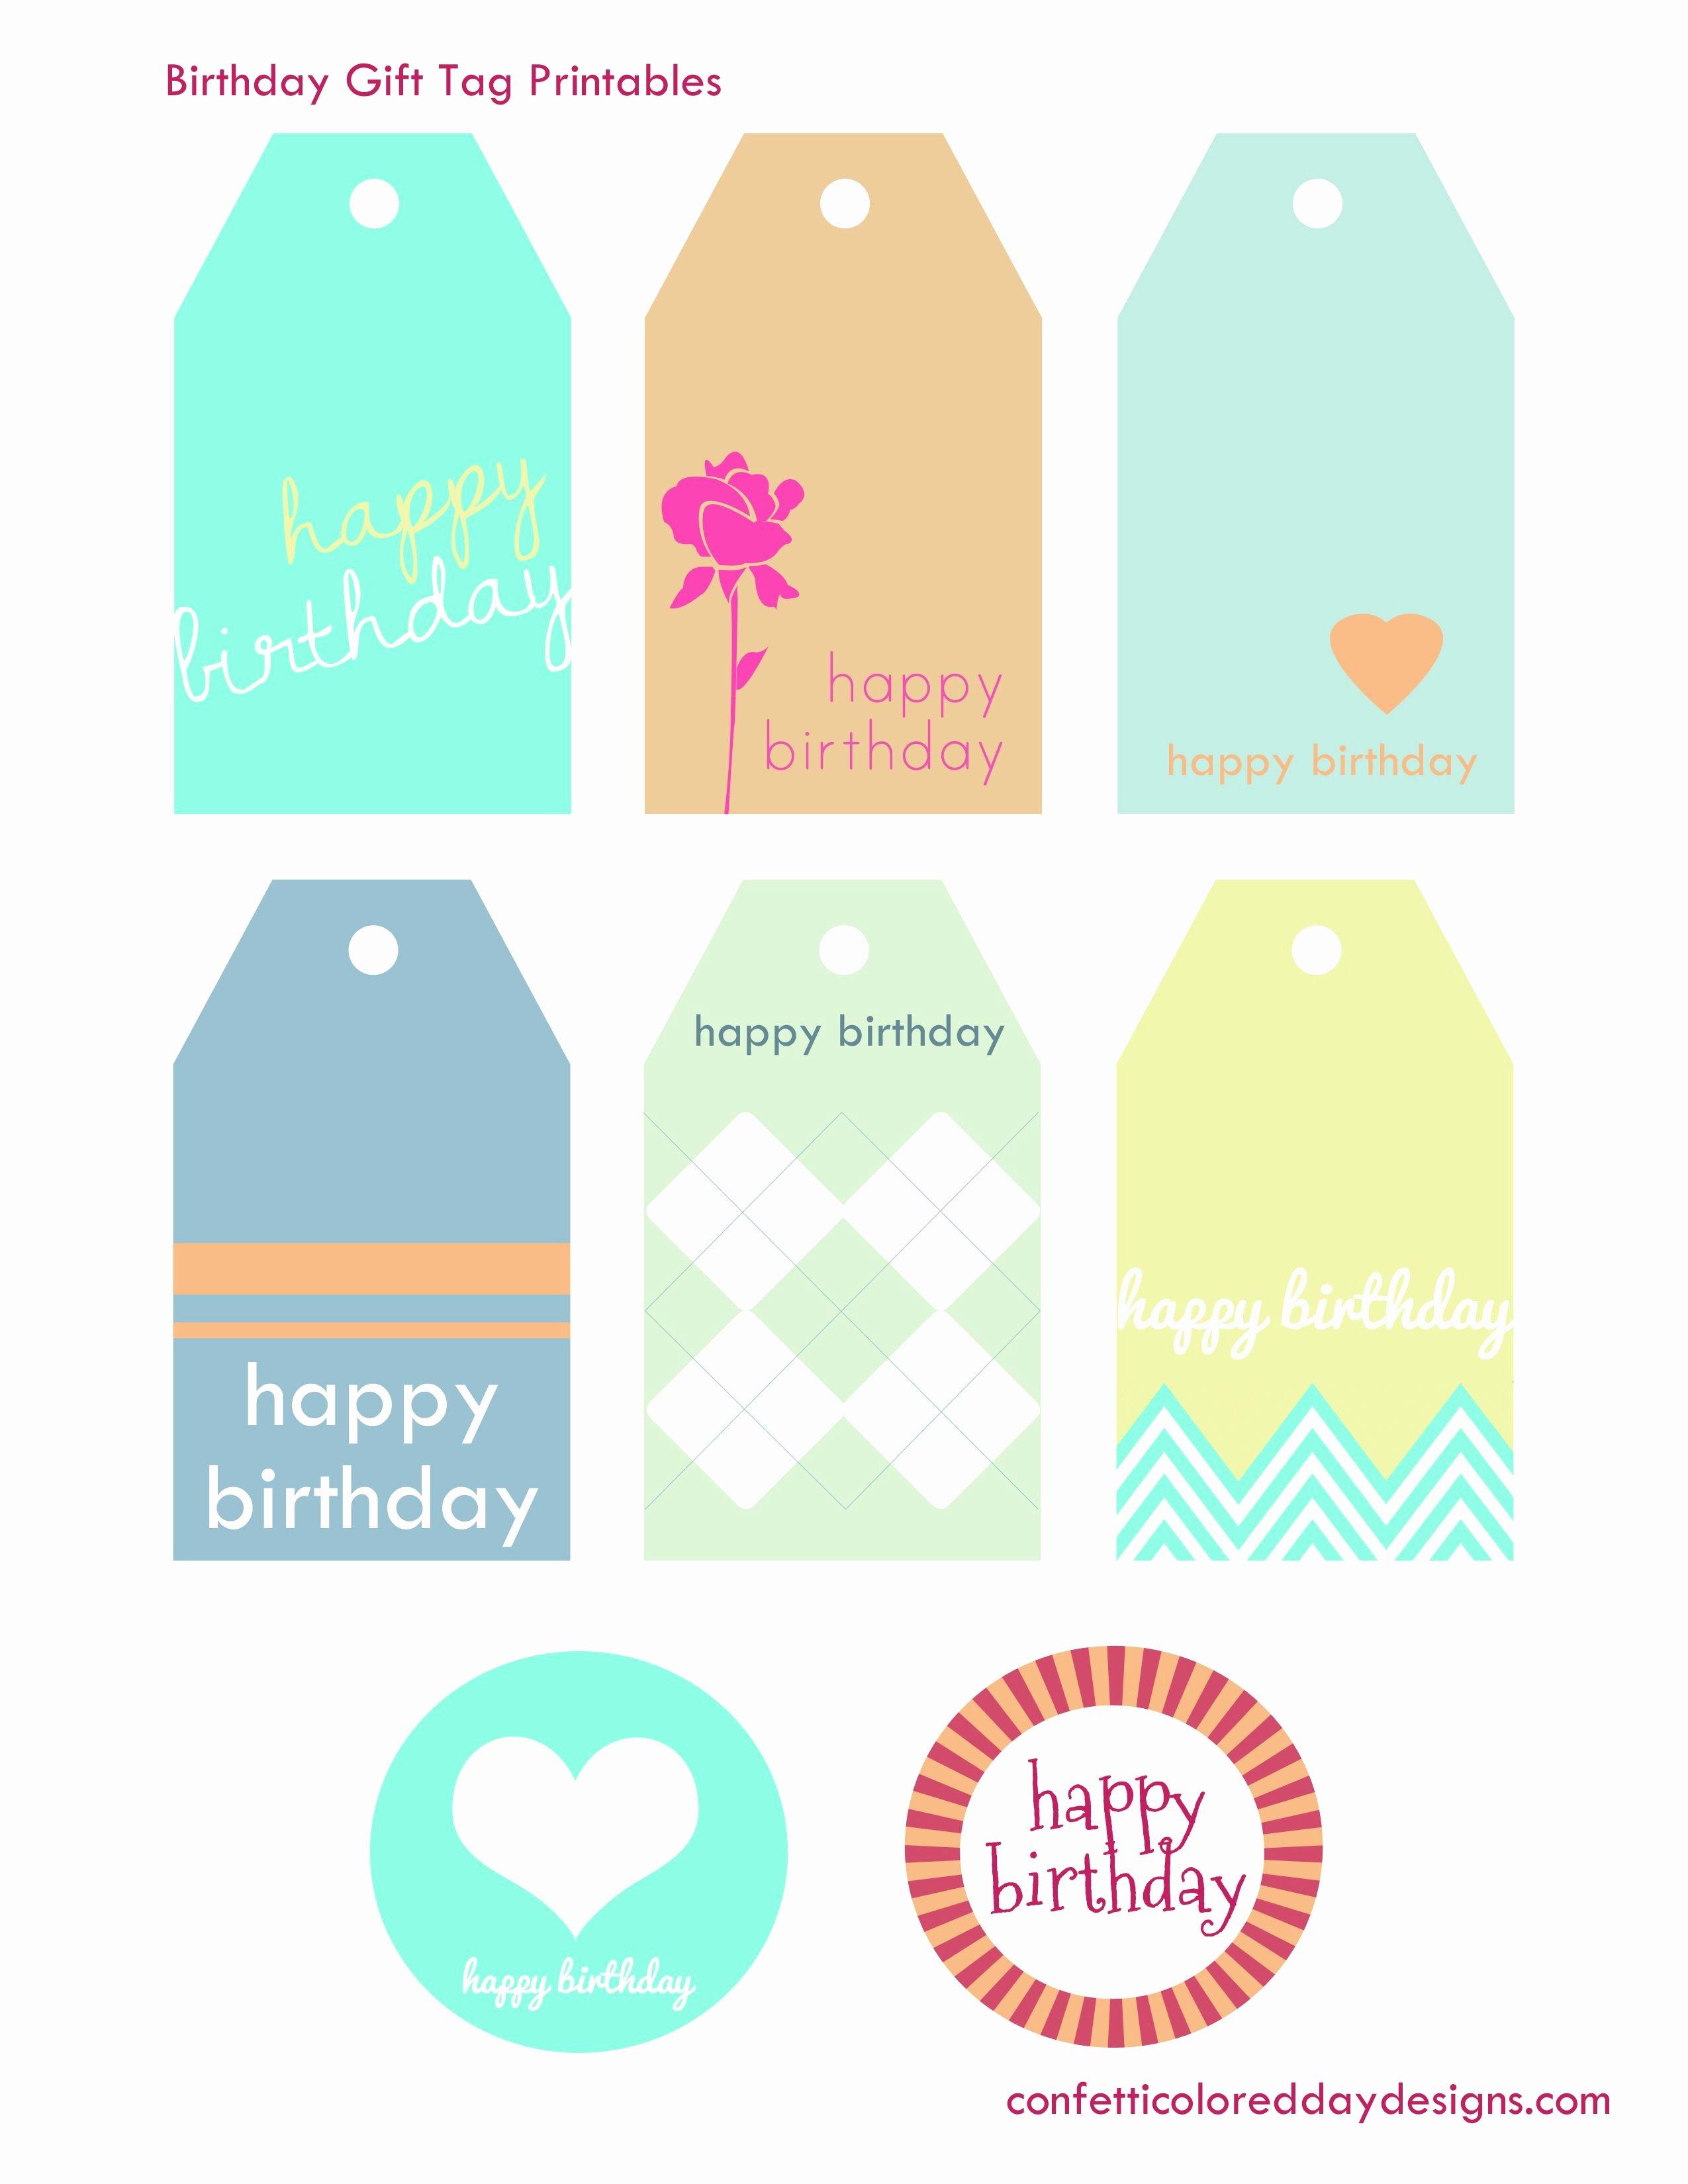 Printable Birthday Gift Tags New Free Printable Birthday Gift Tags From Confetti Colored